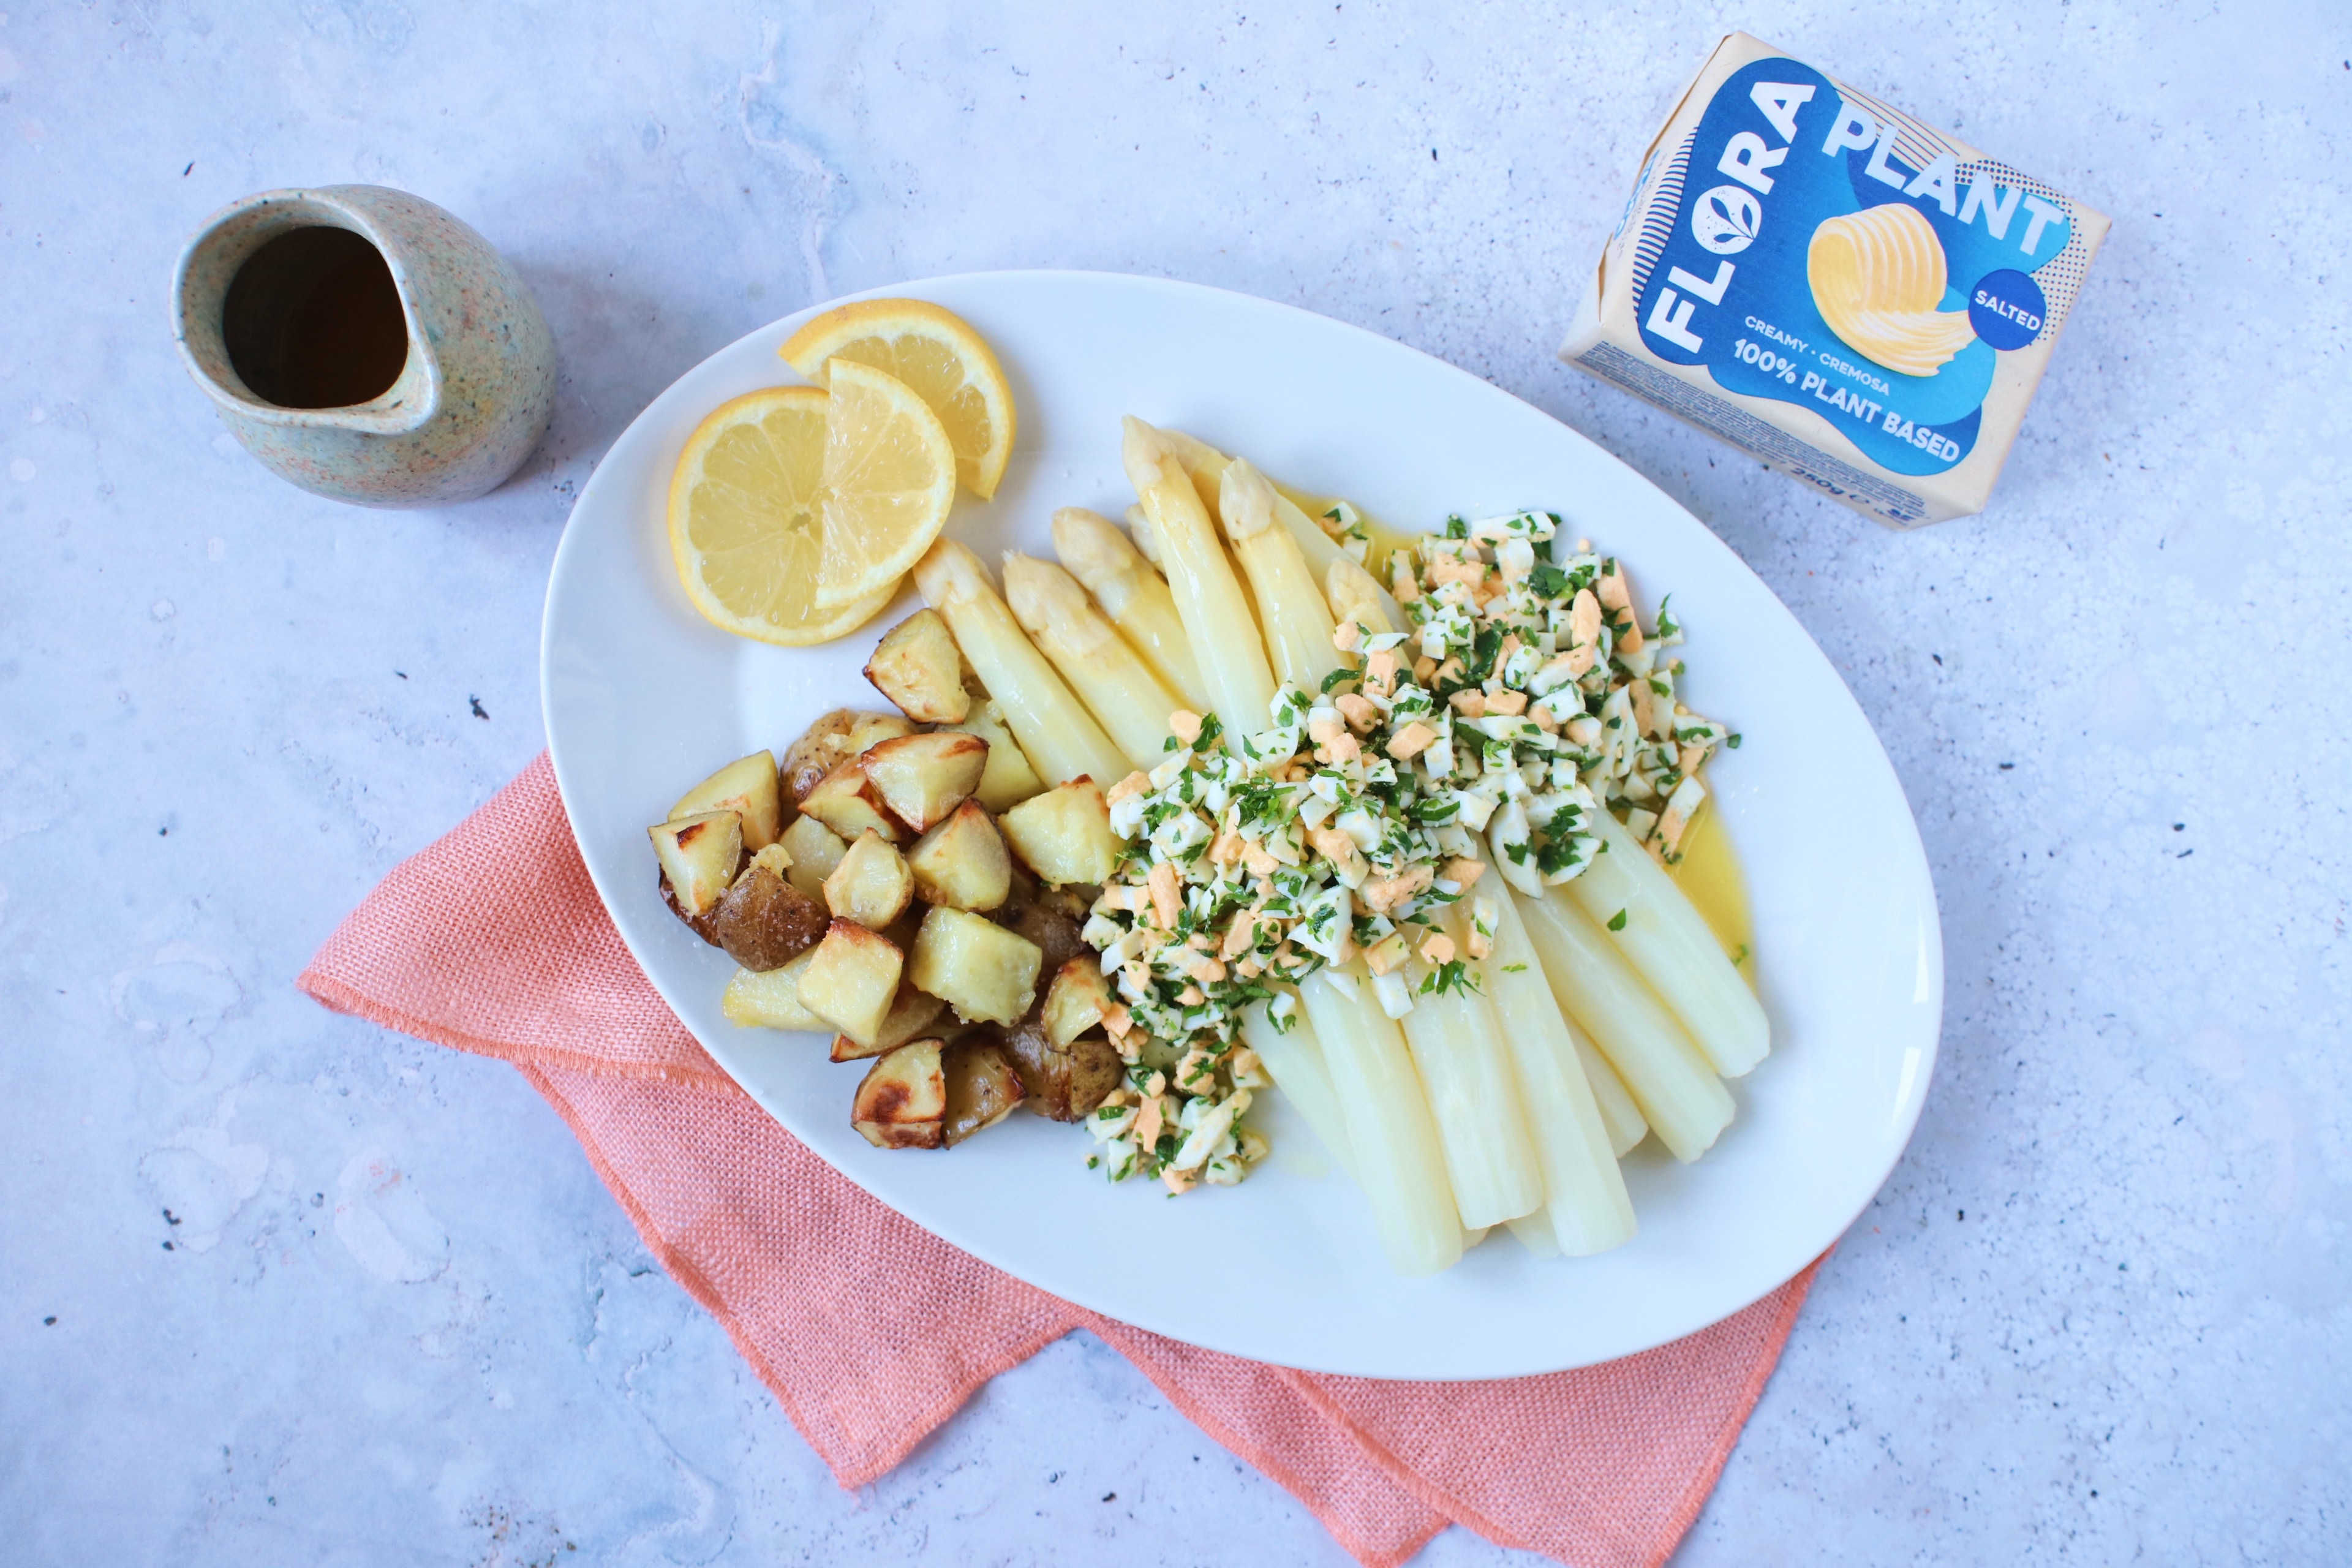 Recept Witte asperges met ei en plantaardige botersaus www.jaimyskitchen.nl